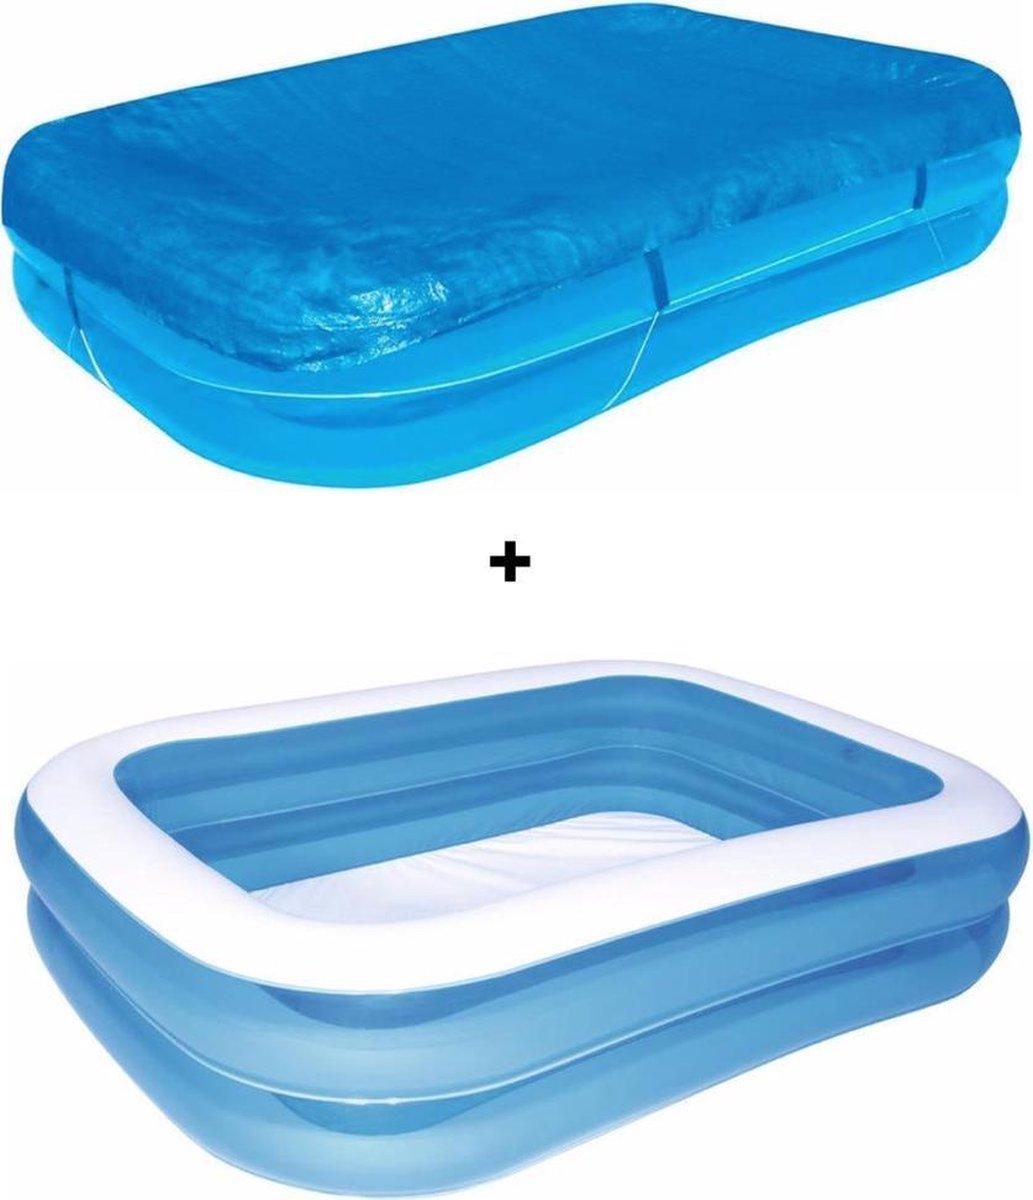 Zwembad - 262 x 175 x 51 cm - Opblaasbare zwembad - opzetzwembaden - opblaaszwembad - zwembad- zwembaden - Zwembadset + GRATIS AFDEKZEIL